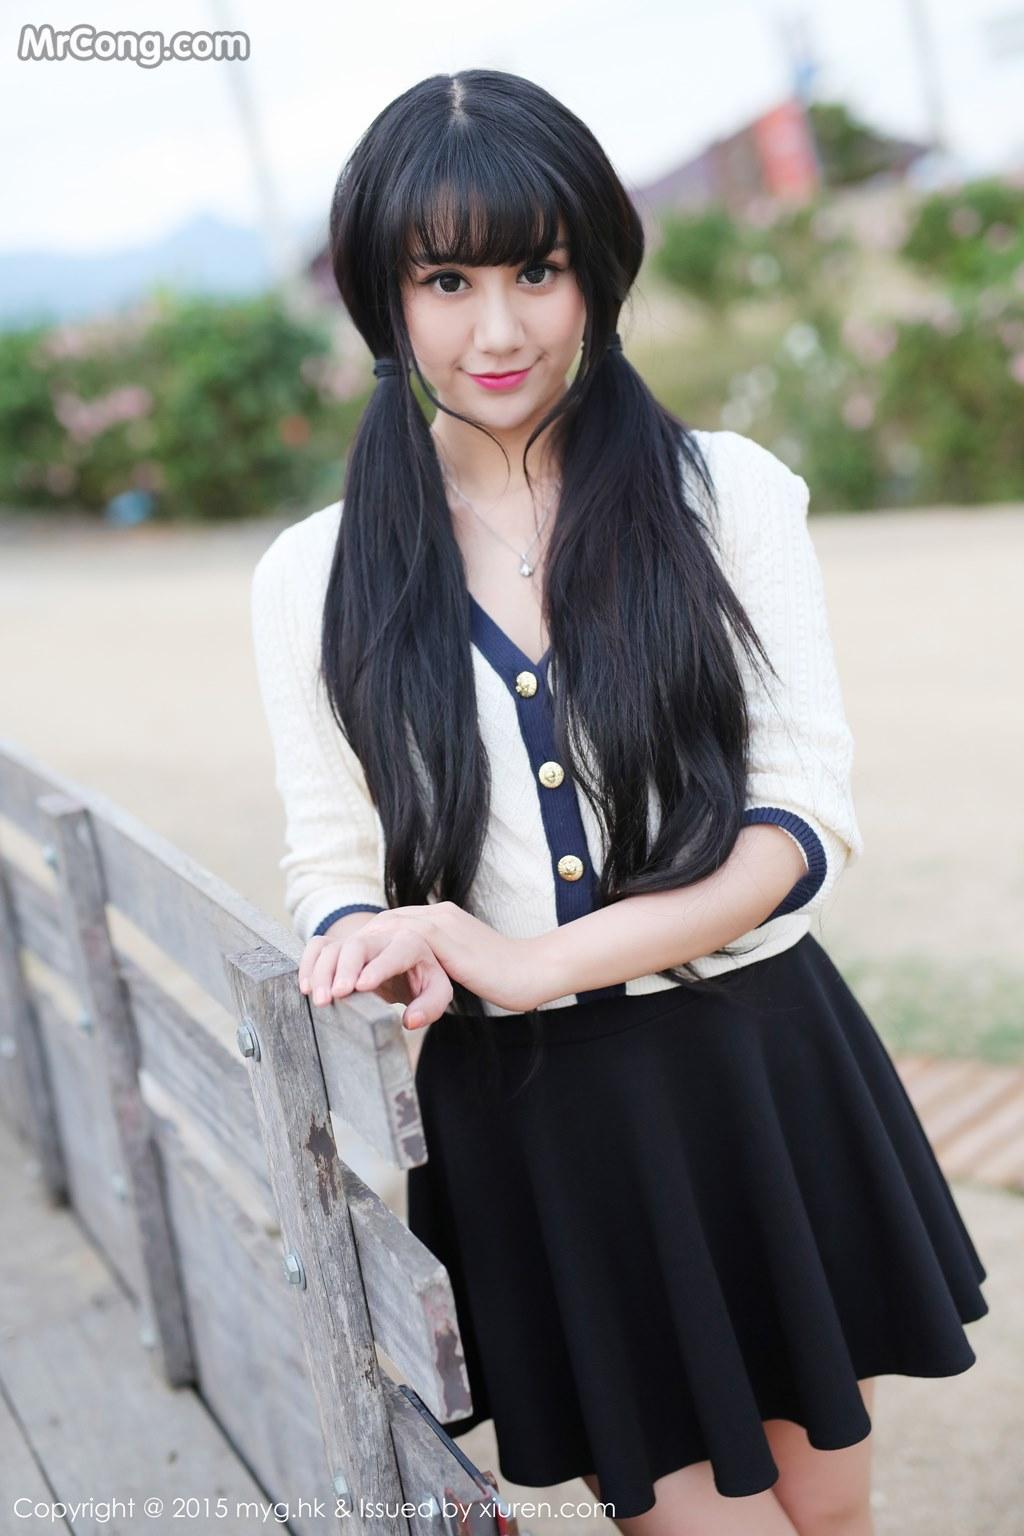 MyGirl Vol.102: Model Yang Xiao Qing Er (杨晓青儿) (61P)